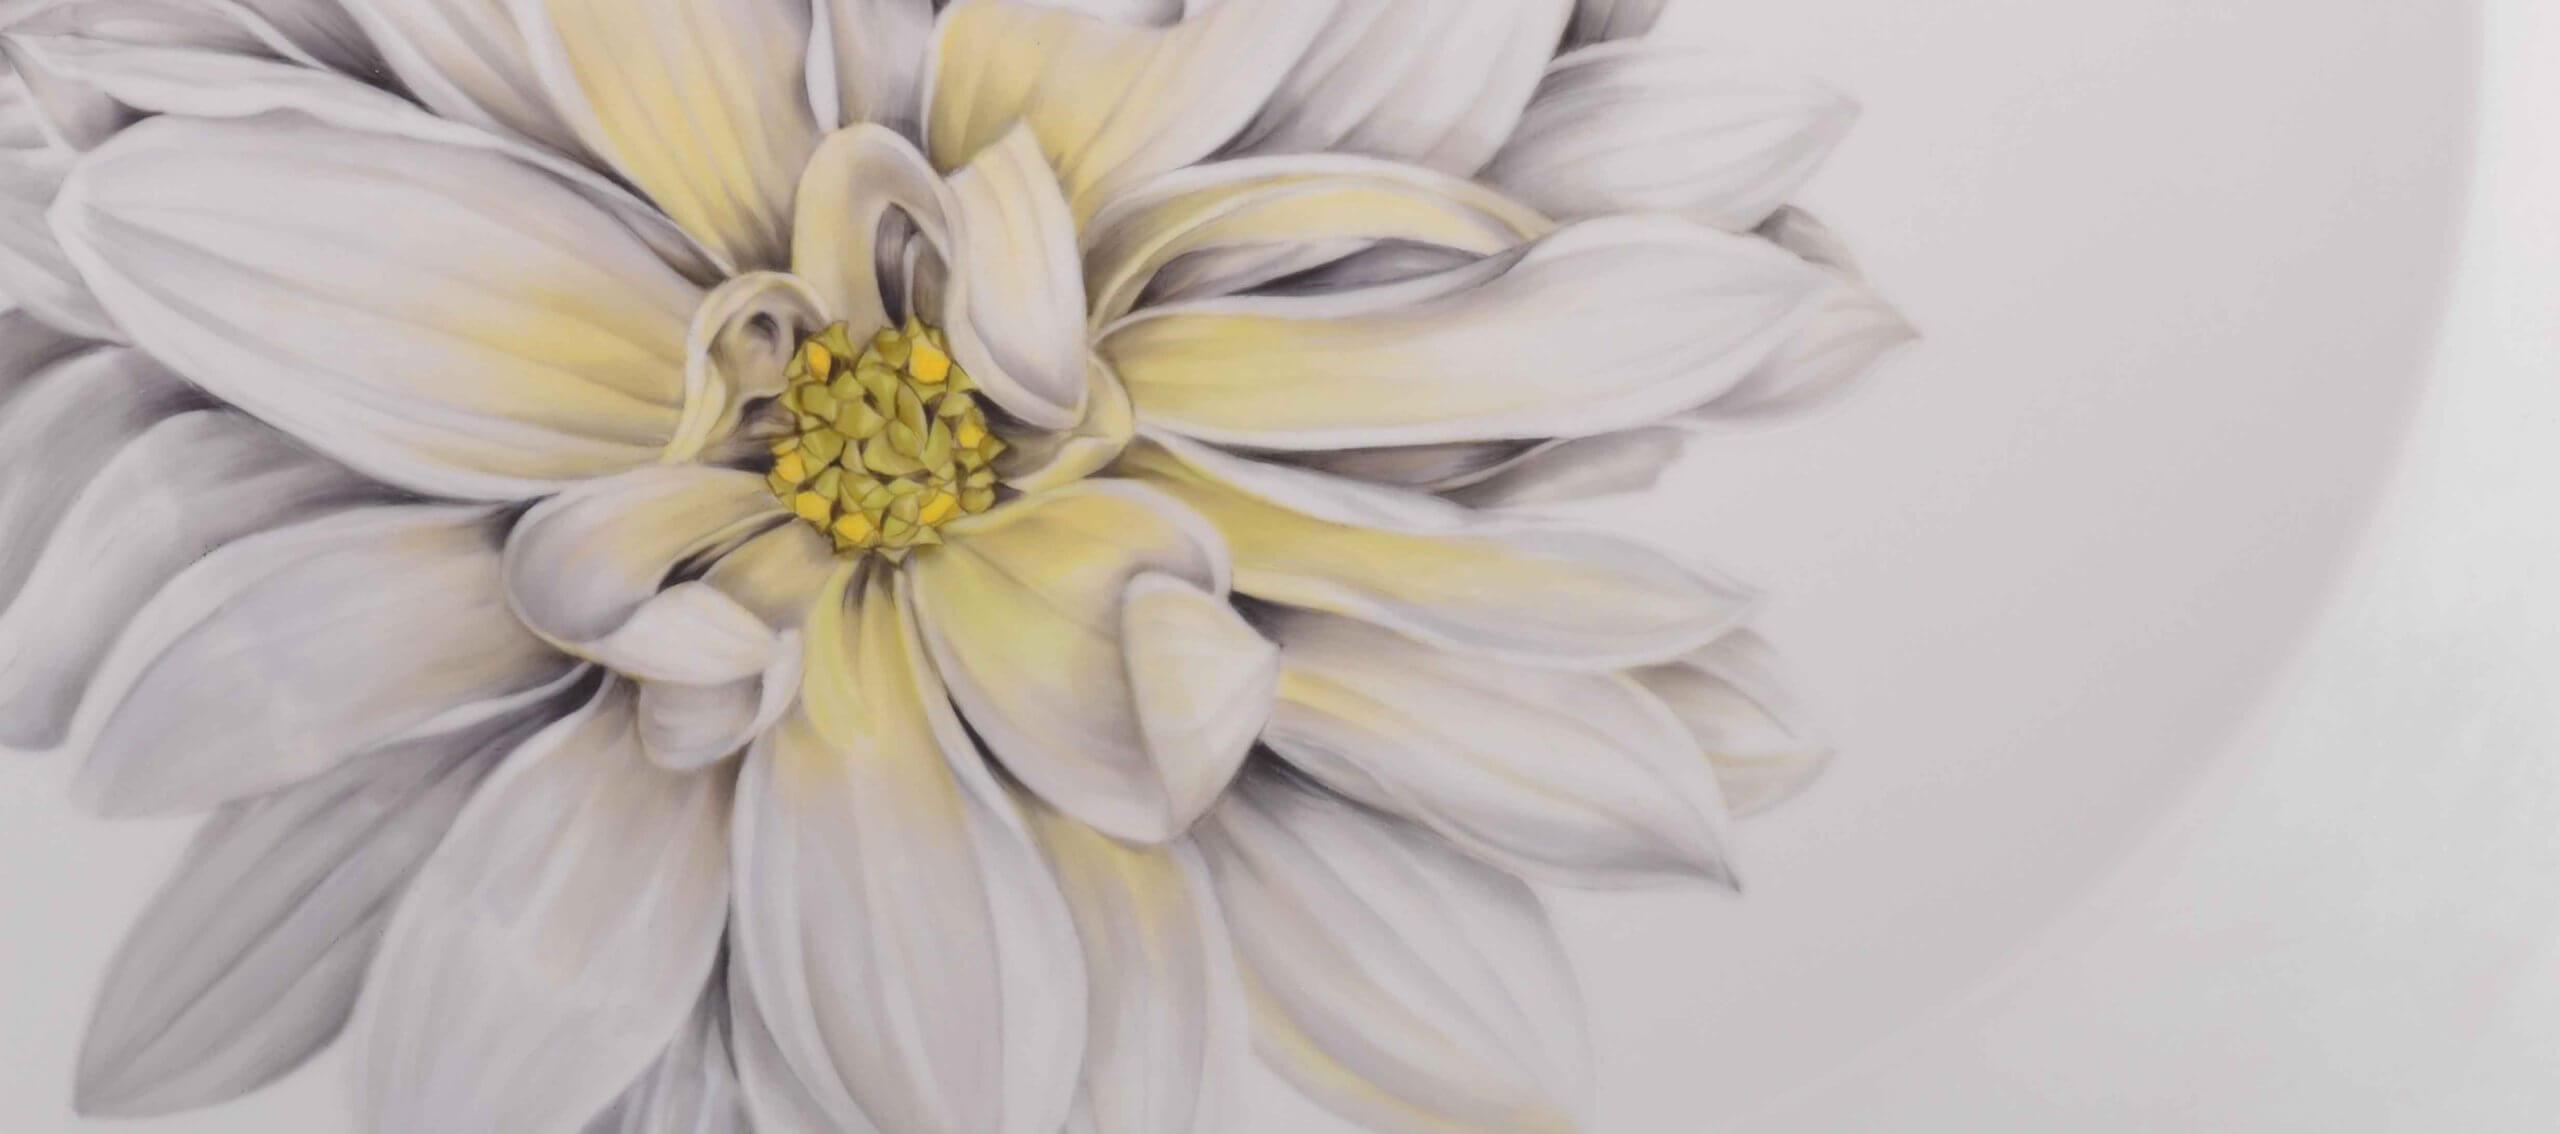 Lotti Haerdi - Atelier für handbemaltes Porzellen